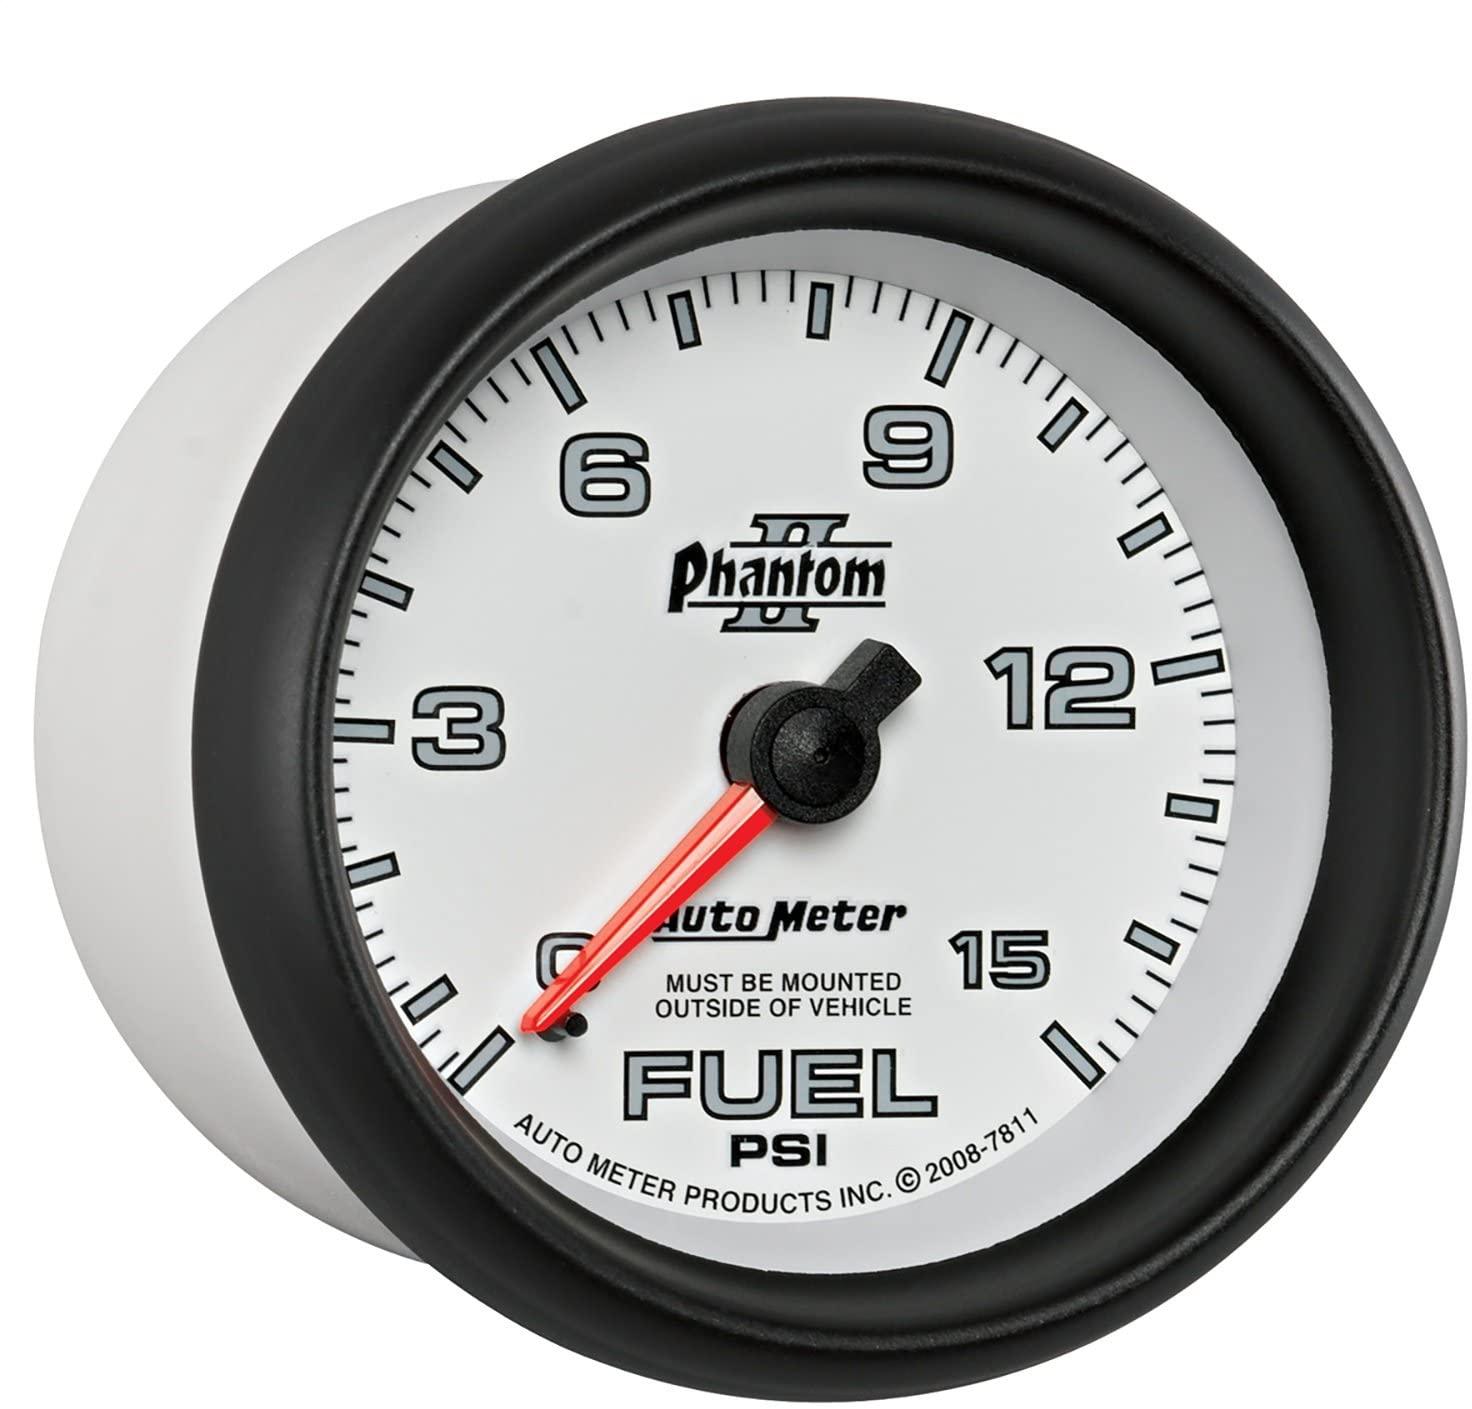 Auto Meter 7811 Phantom II Mechanical Fuel Pressure Gauge